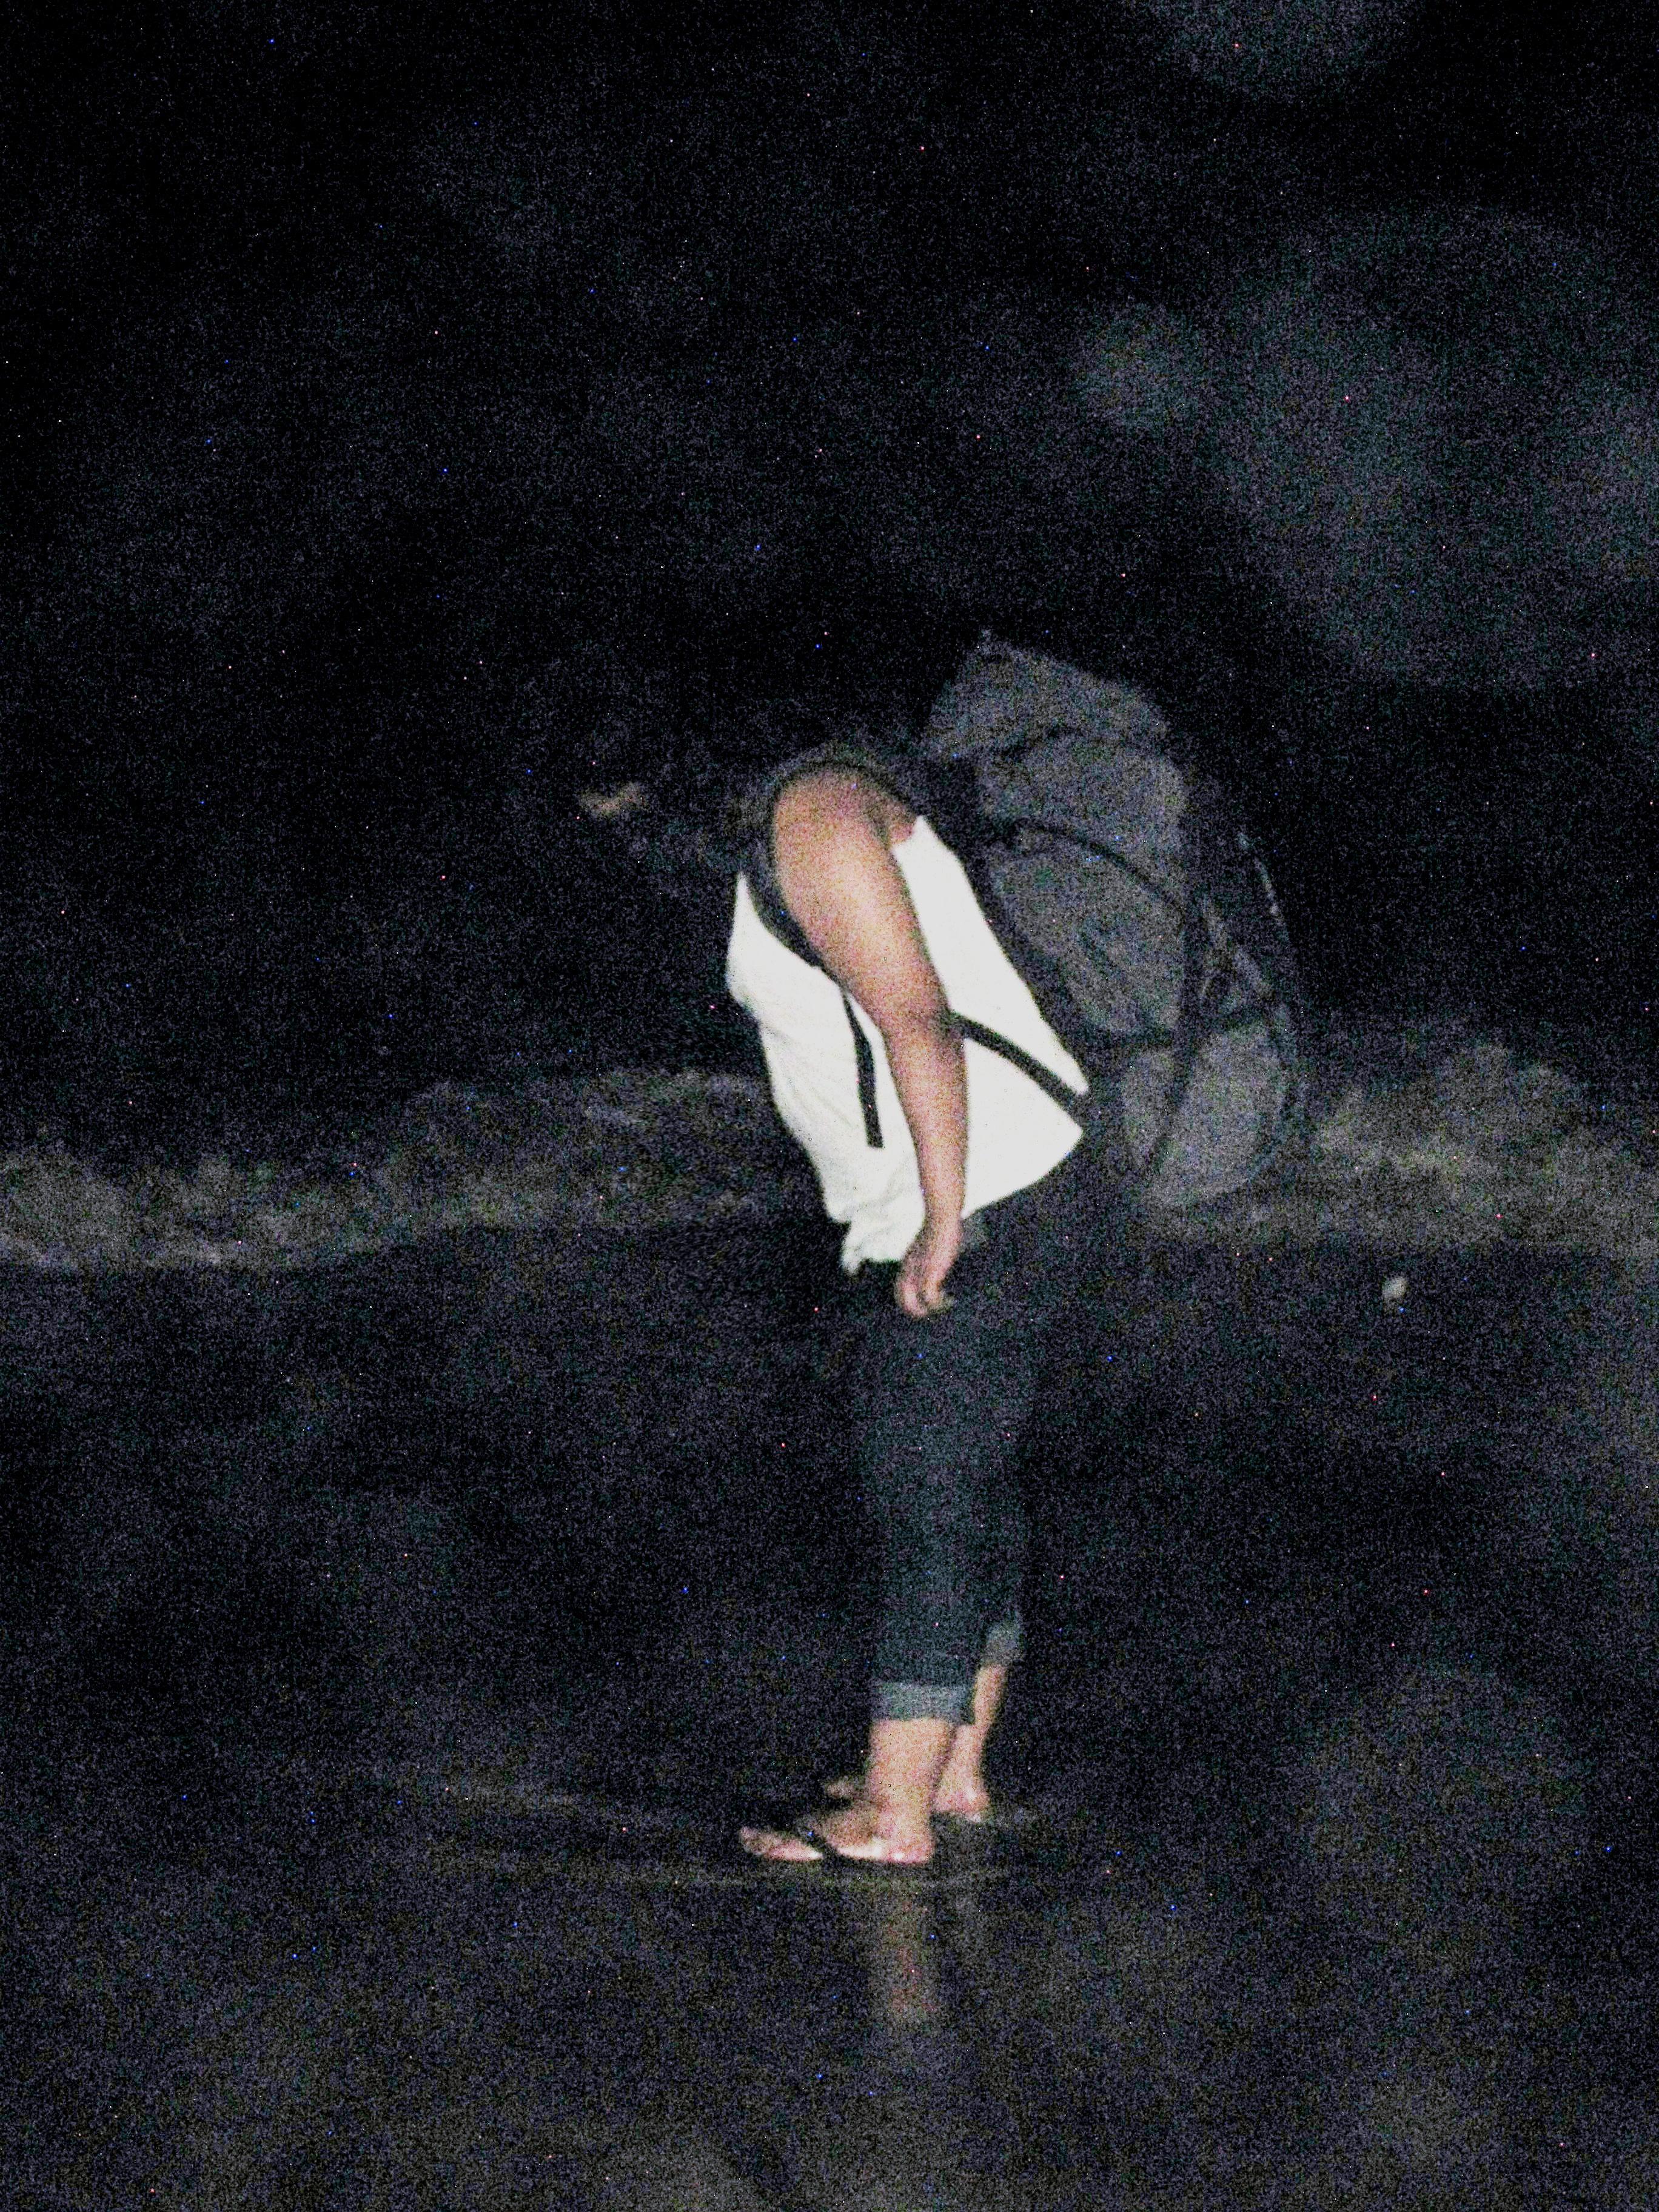 On The Beach At Night, Alone Analysis